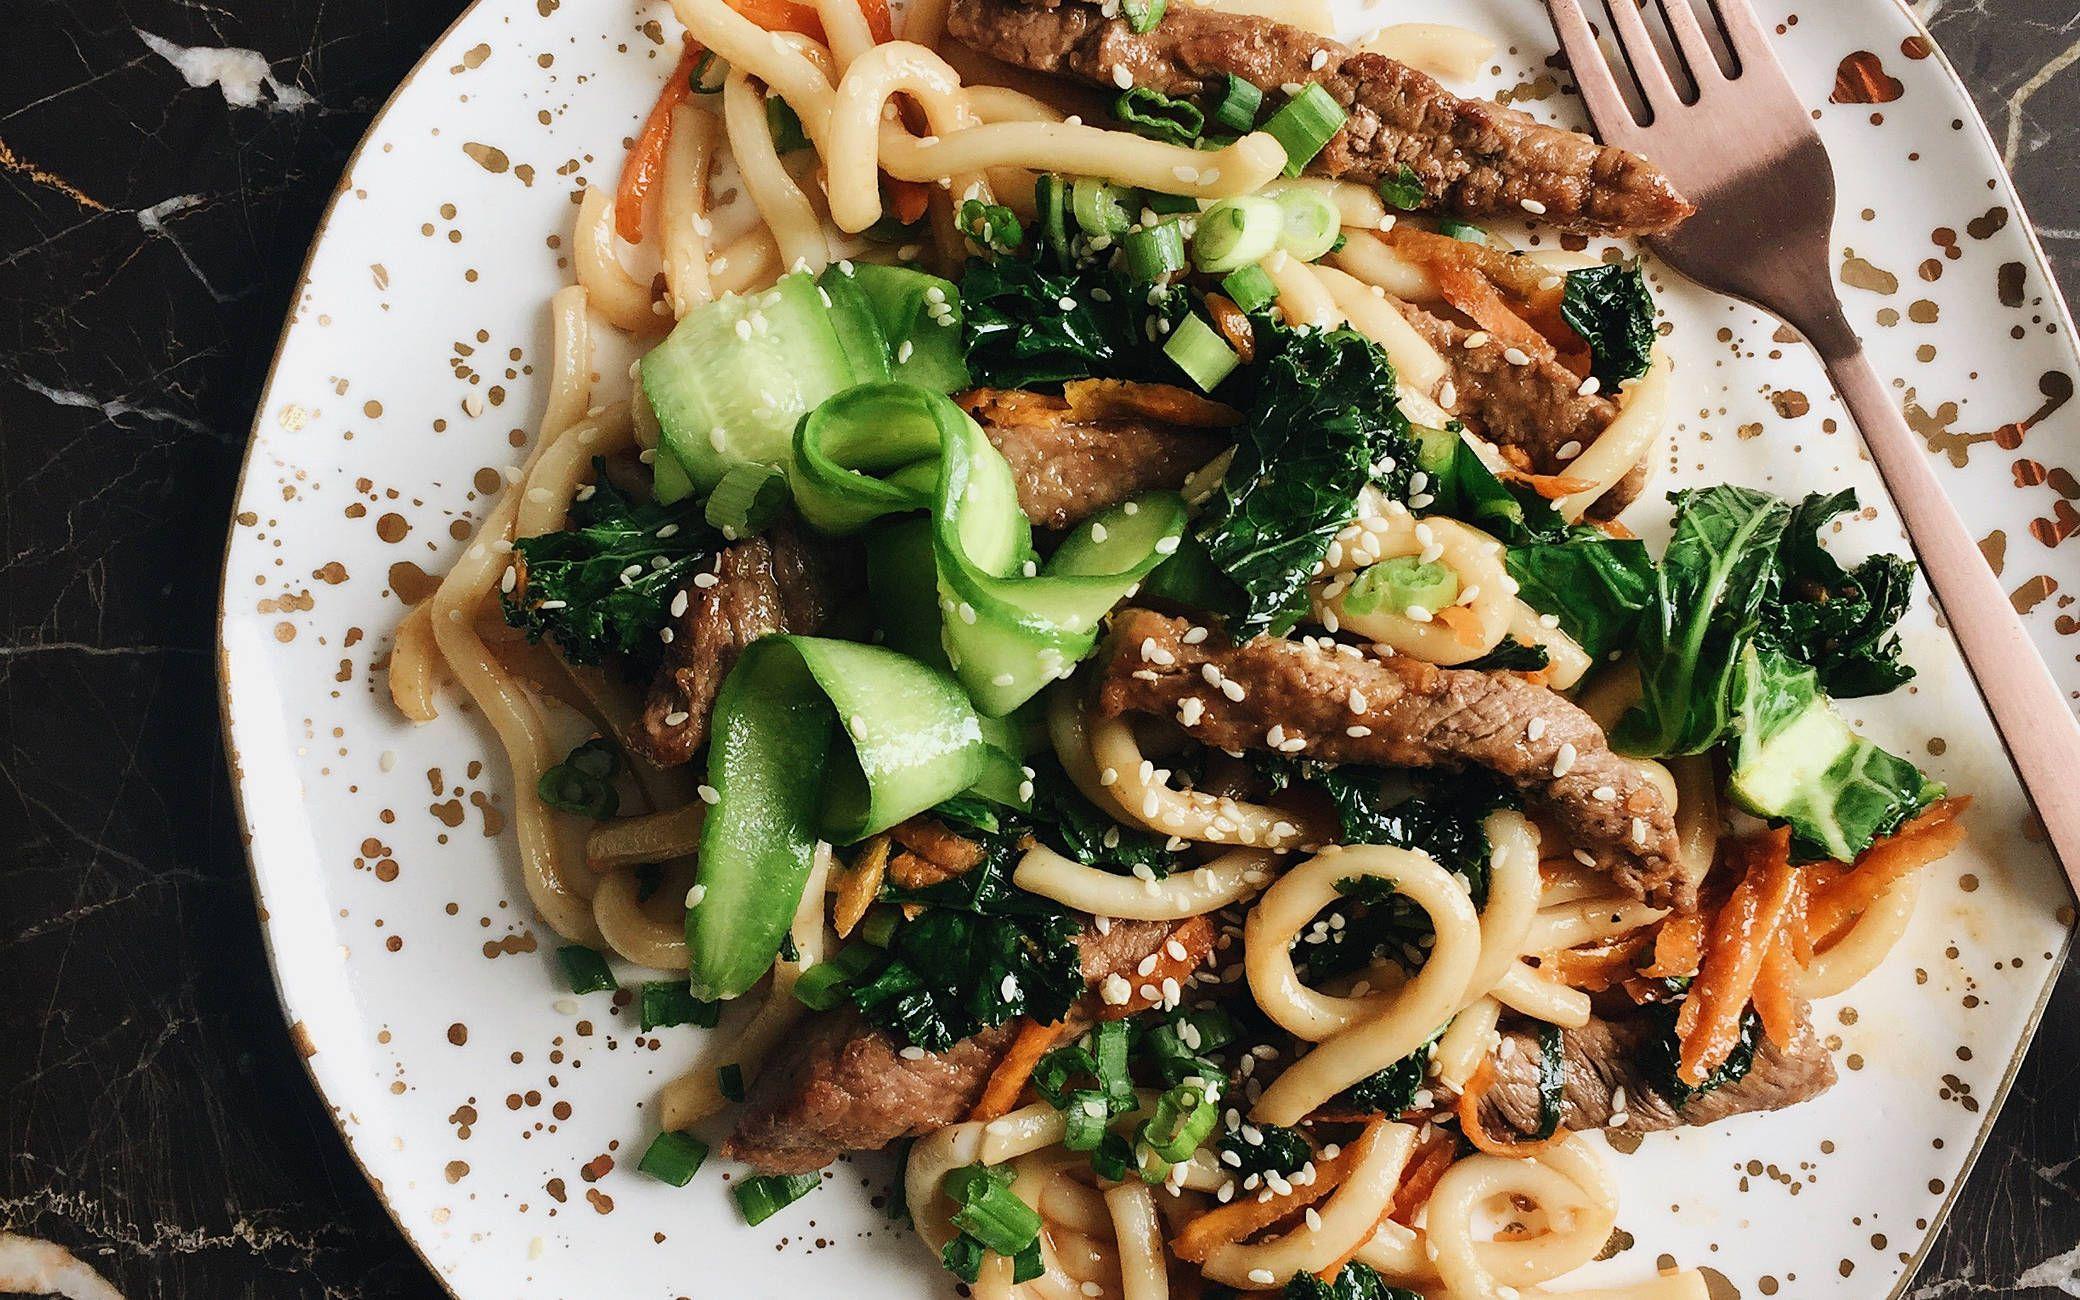 Steak bulgogi | Recipe (With images) | Bulgogi, Fresh food ...